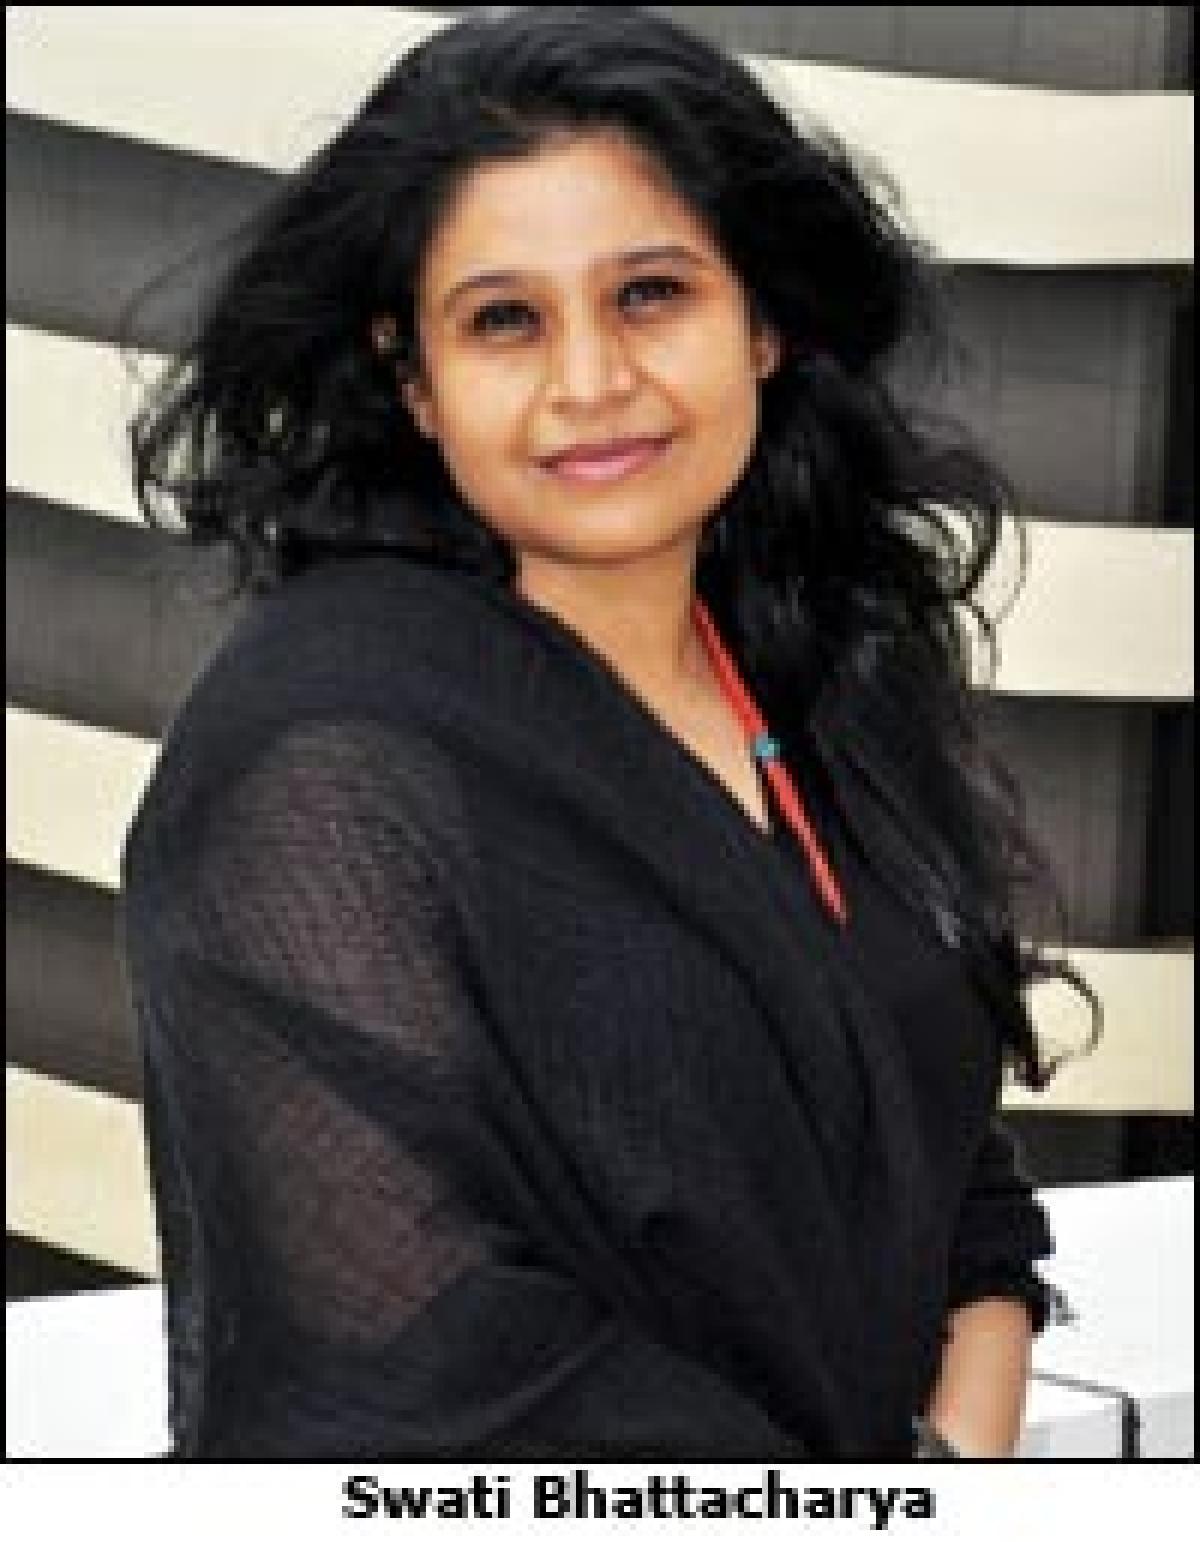 Profile: Swati Bhattacharya: Journey that was to be